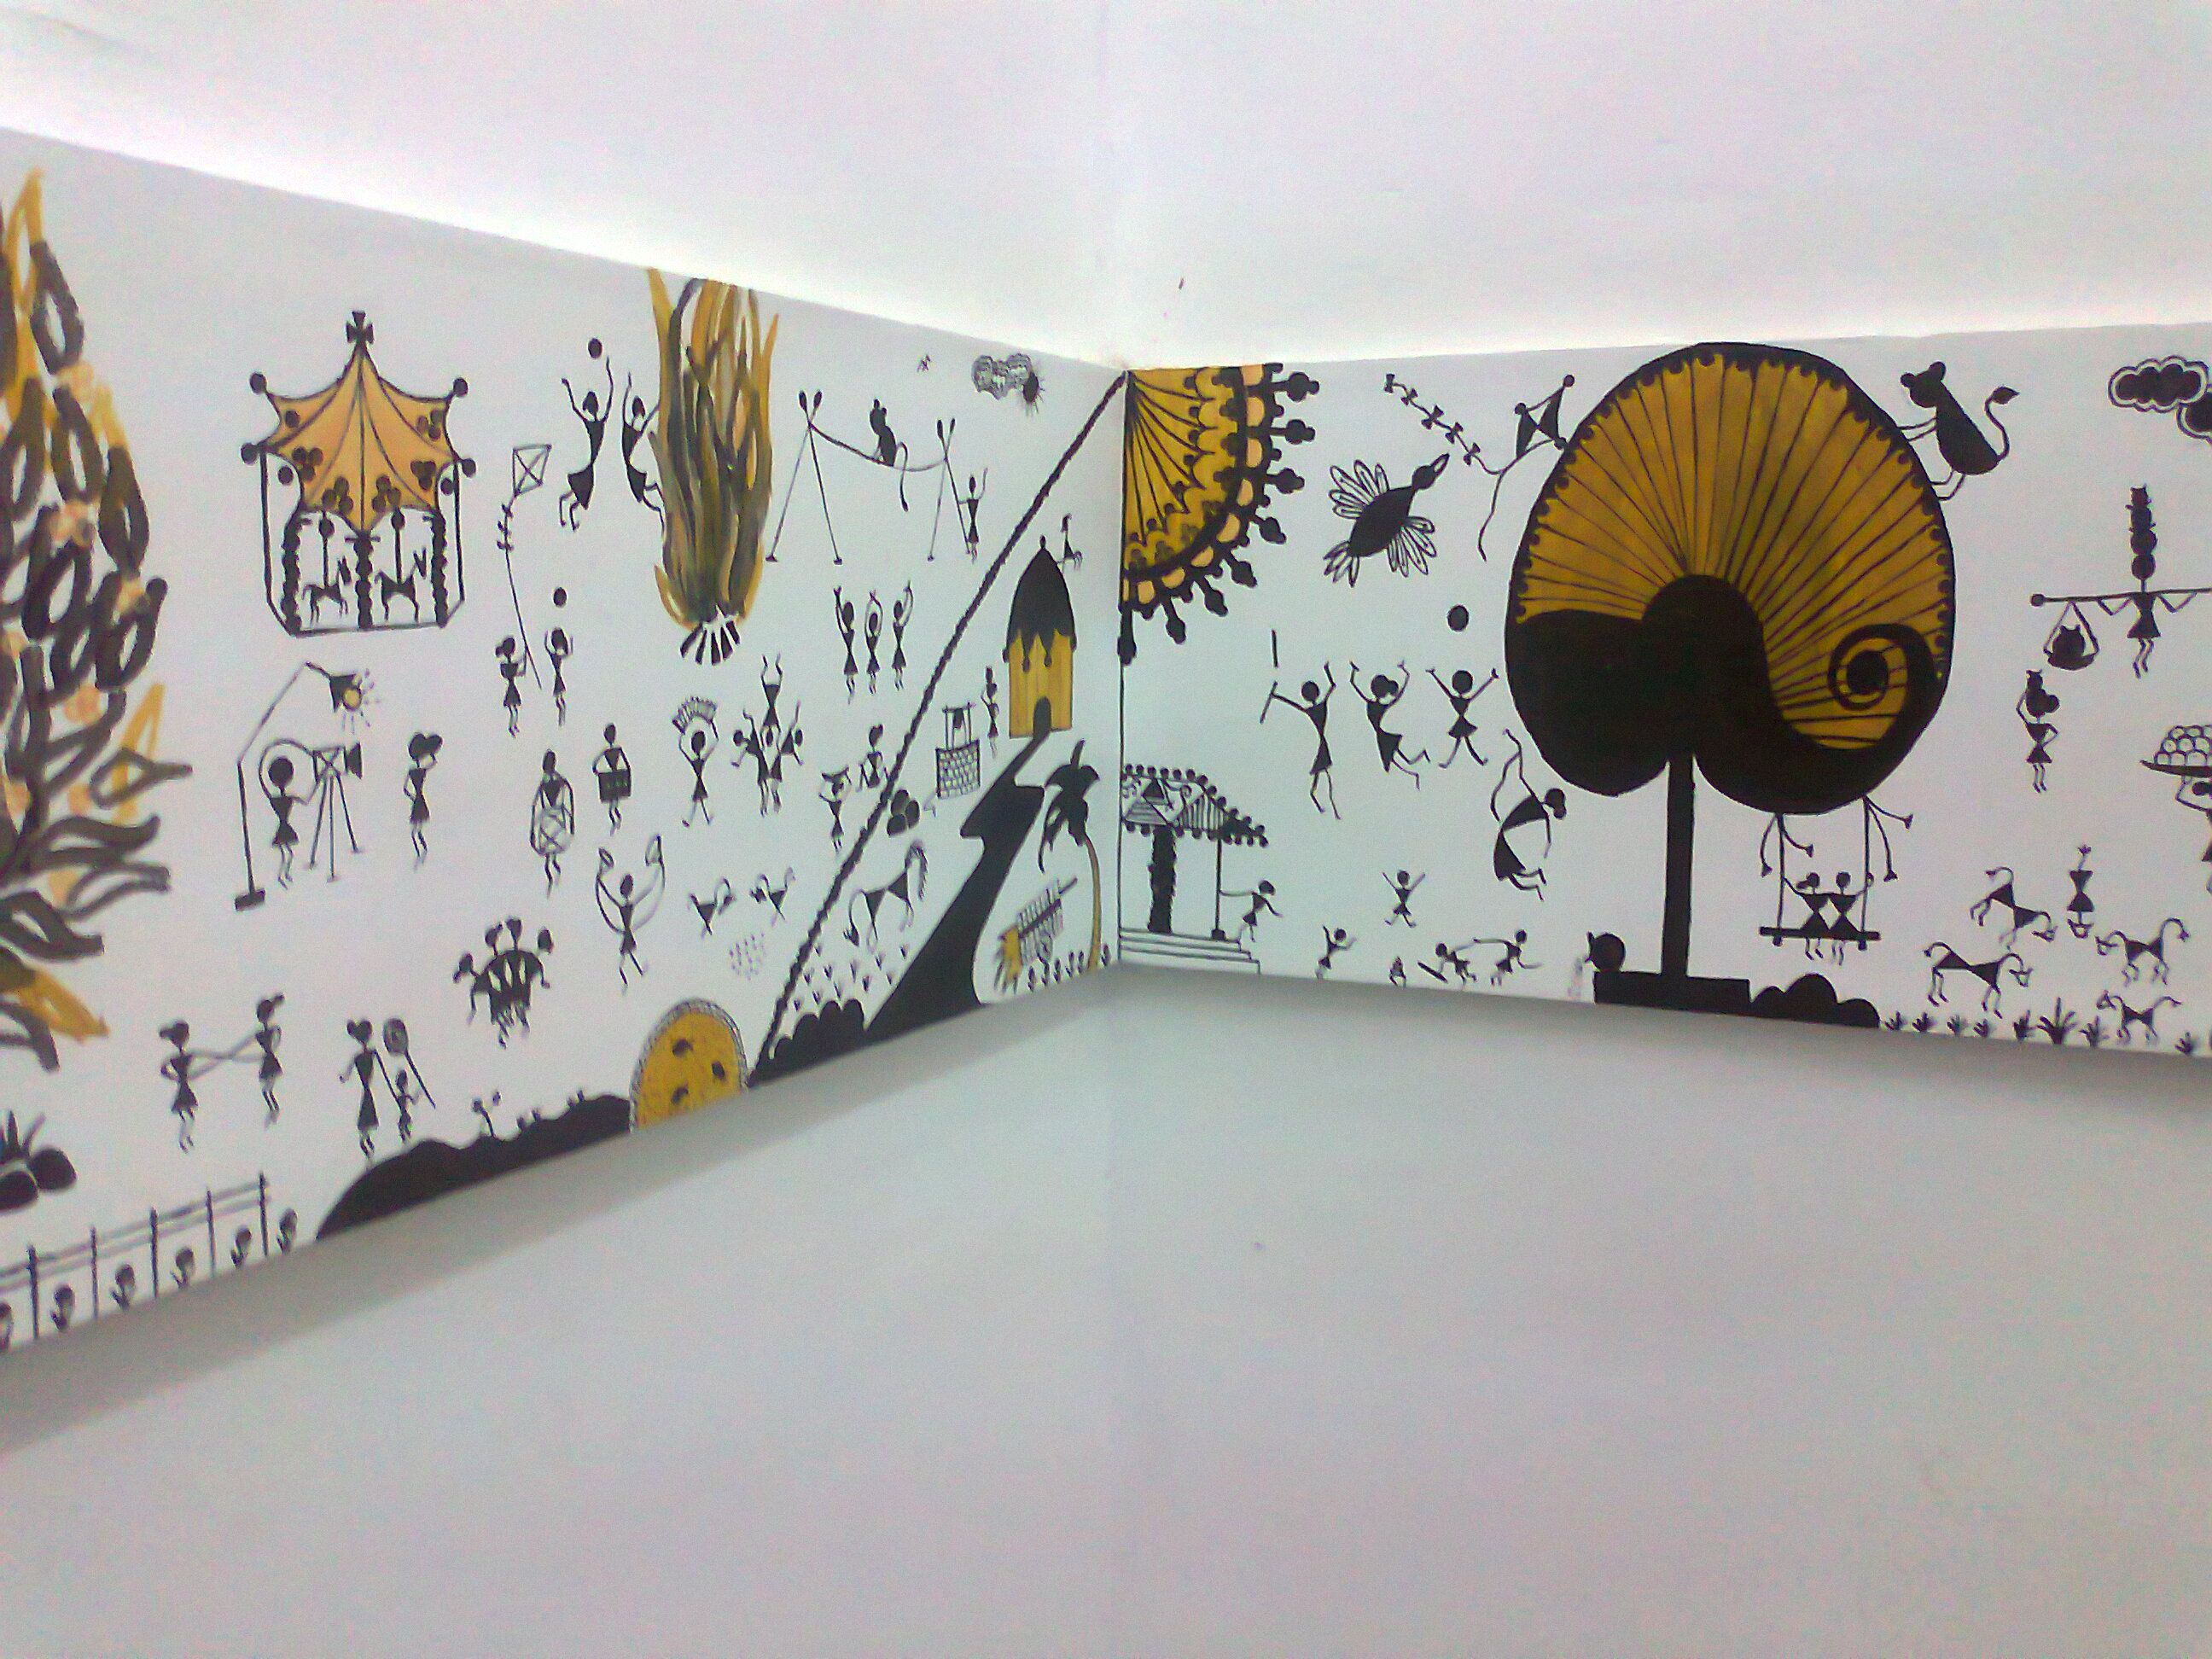 modern Warli wall design | Graphic - Warli | Pinterest ...